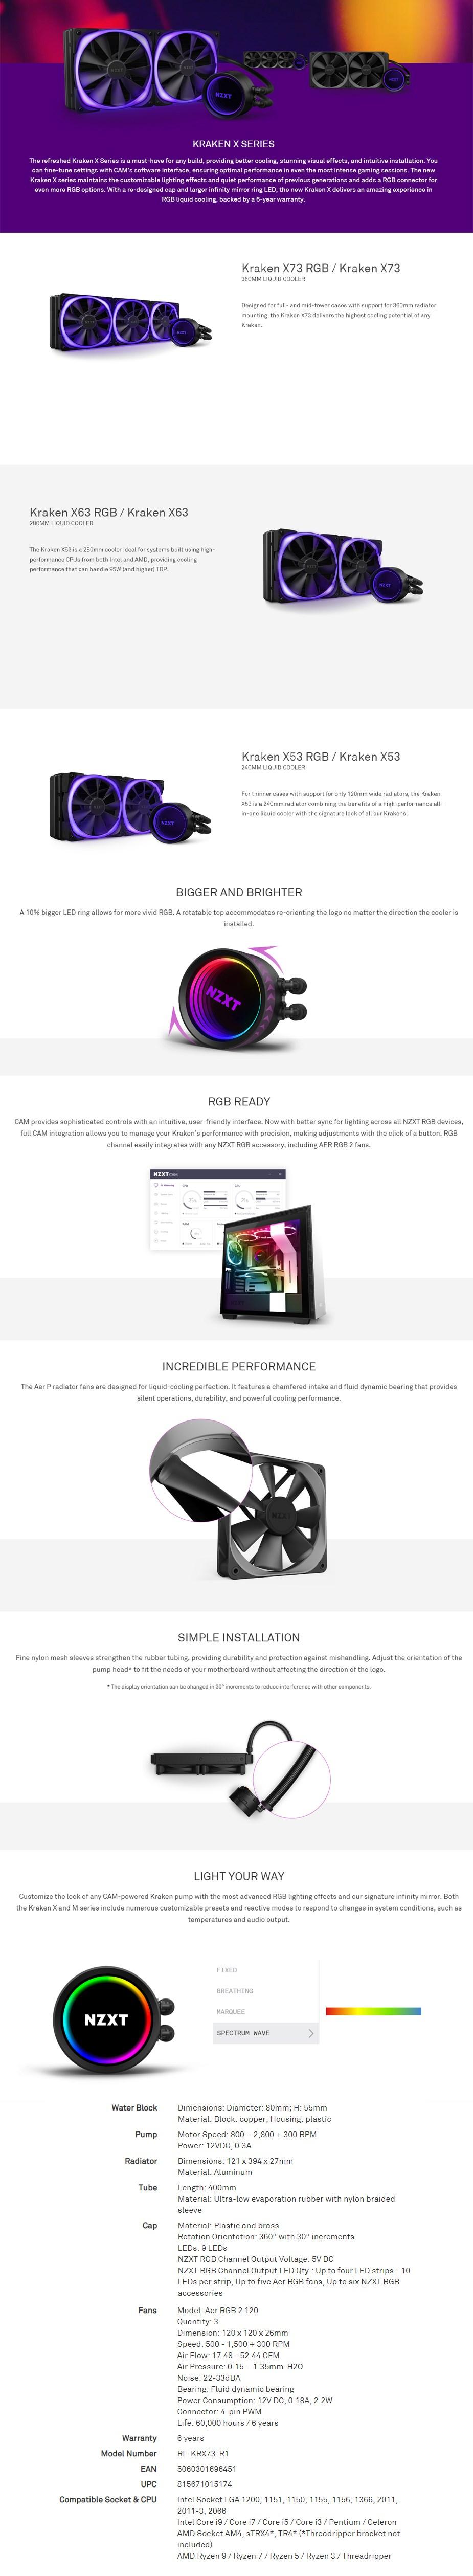 NZXT Kraken X73 360mm RGB AIO Liquid CPU Cooler - Overview 1